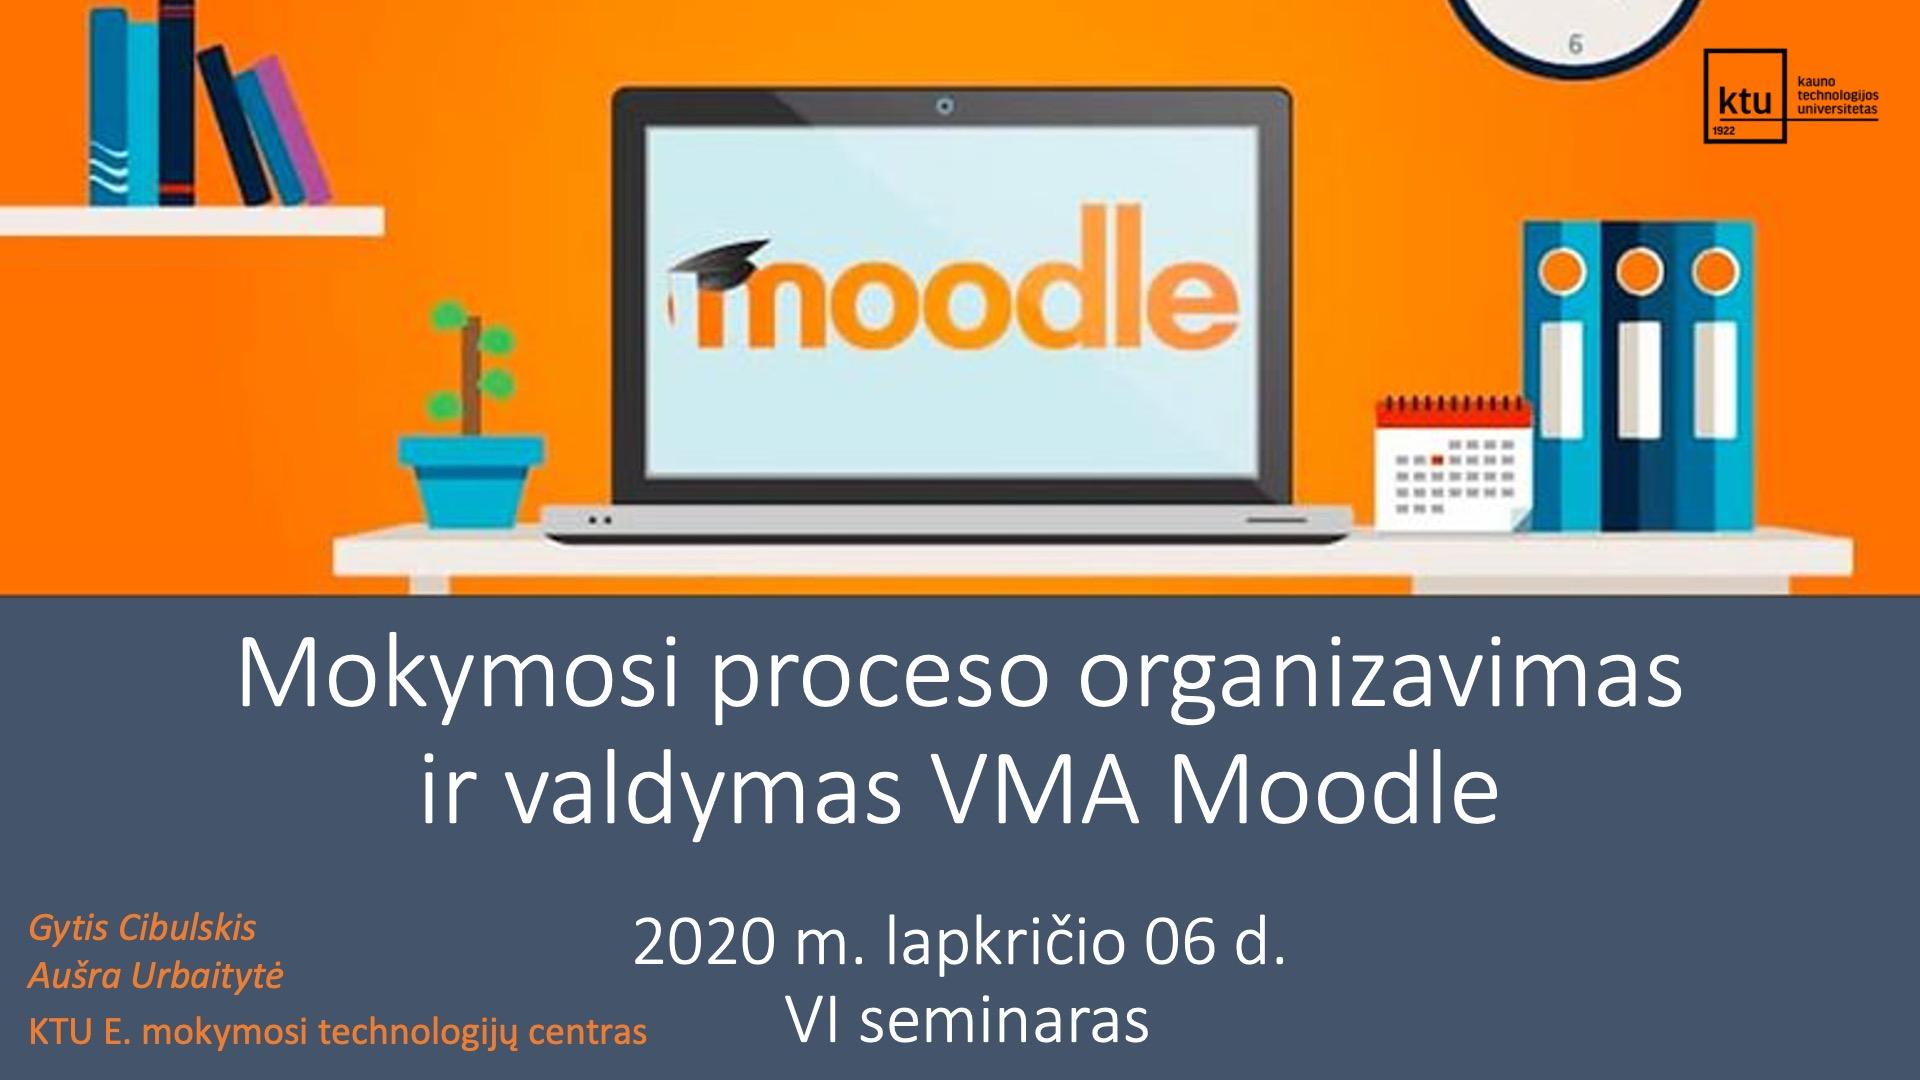 2020.11.06 Moodle mokymai (VI seminaras)